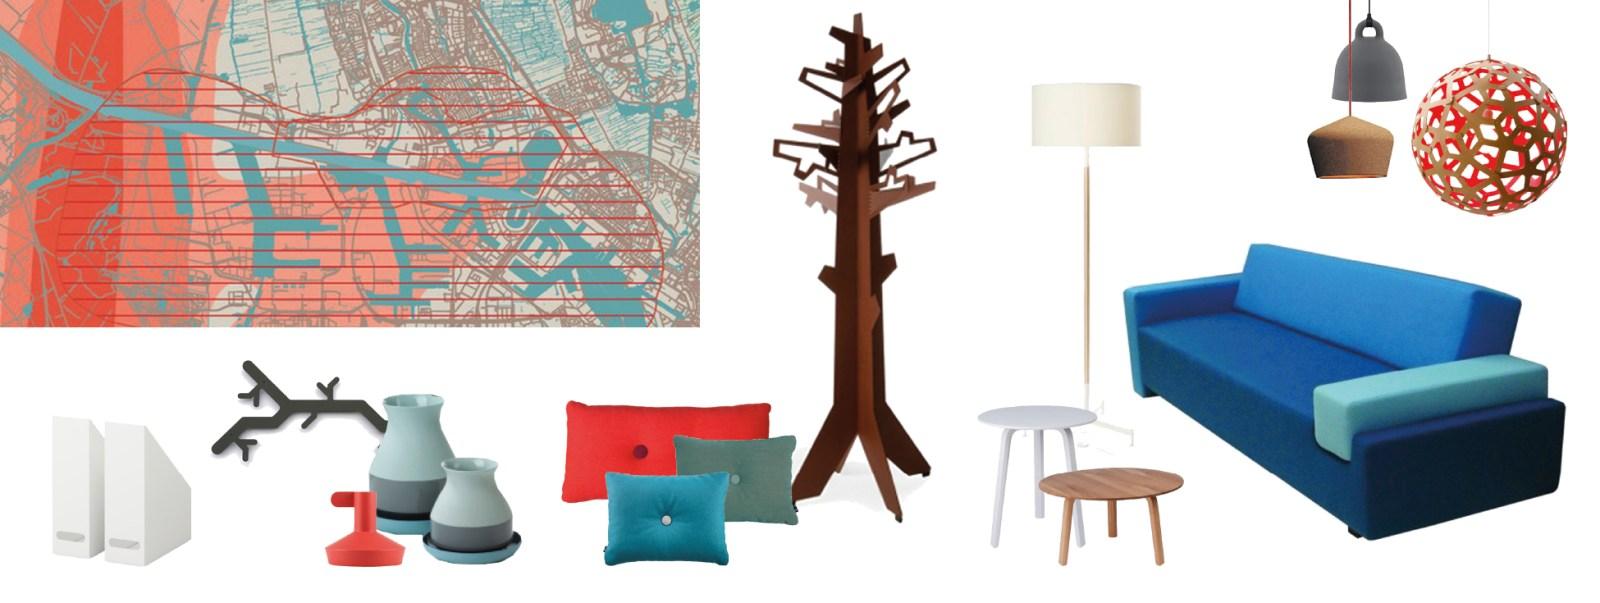 omgevingsdienst stijlkaart lounge rood